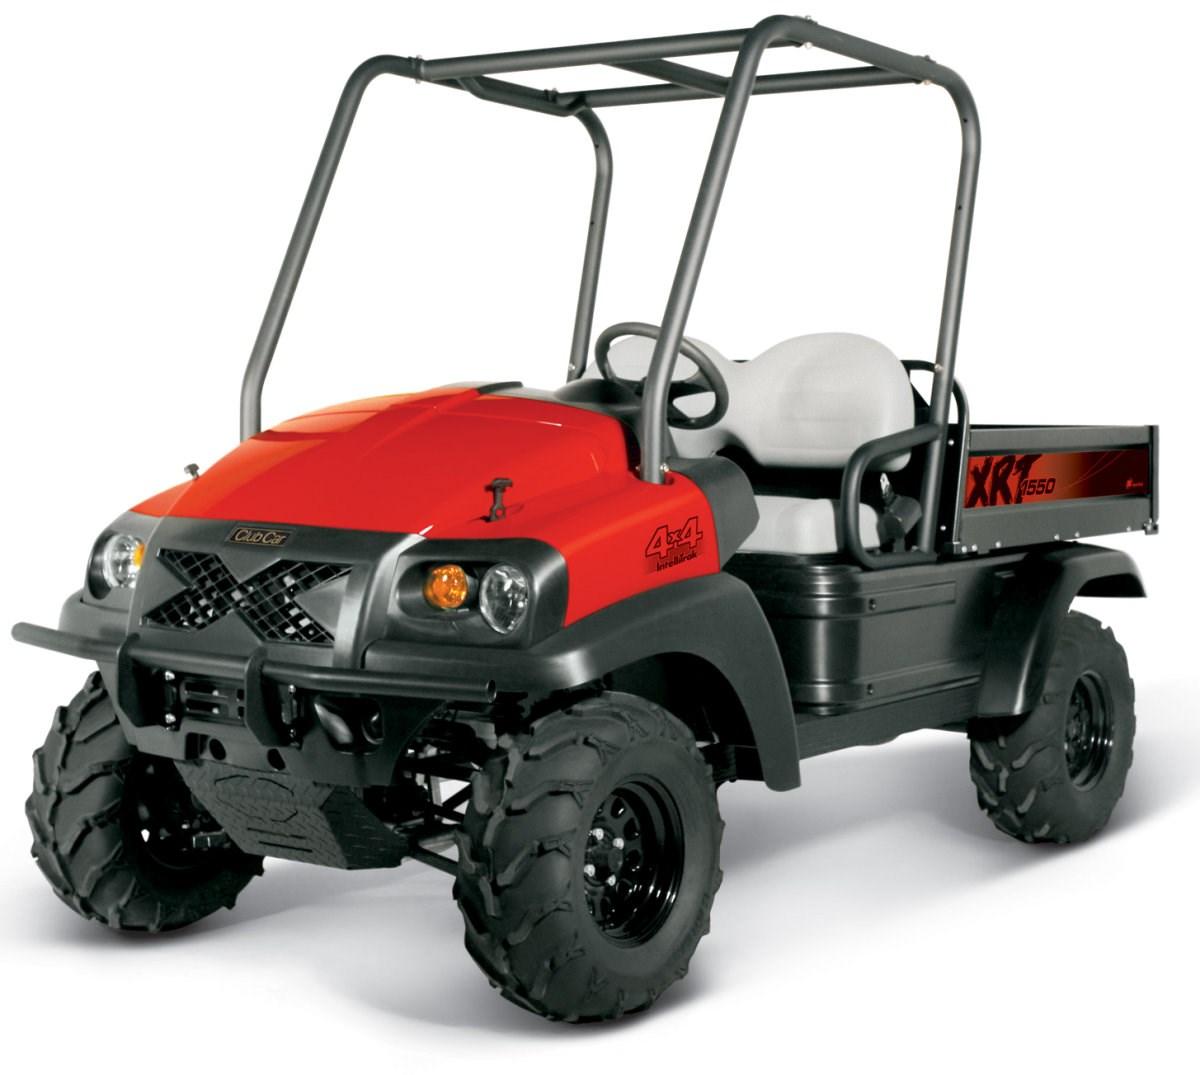 Small Vehicle Resource  Club Car Utility Vehicles  Xrt 1550